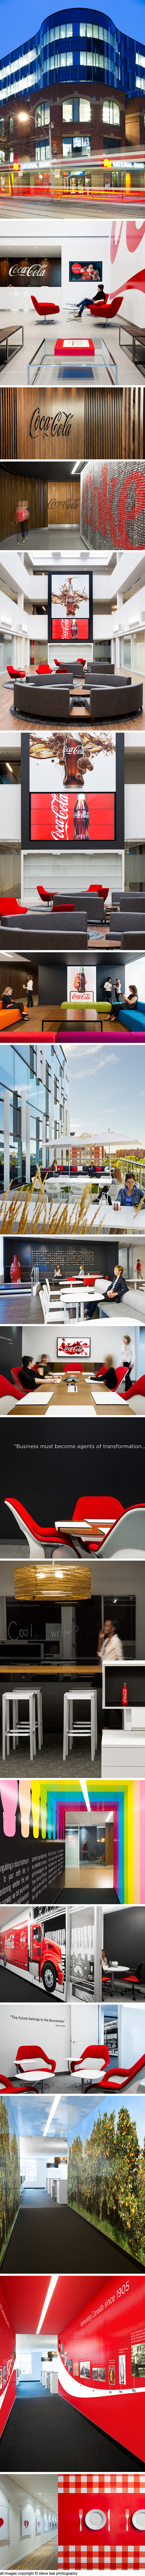 coke interiors